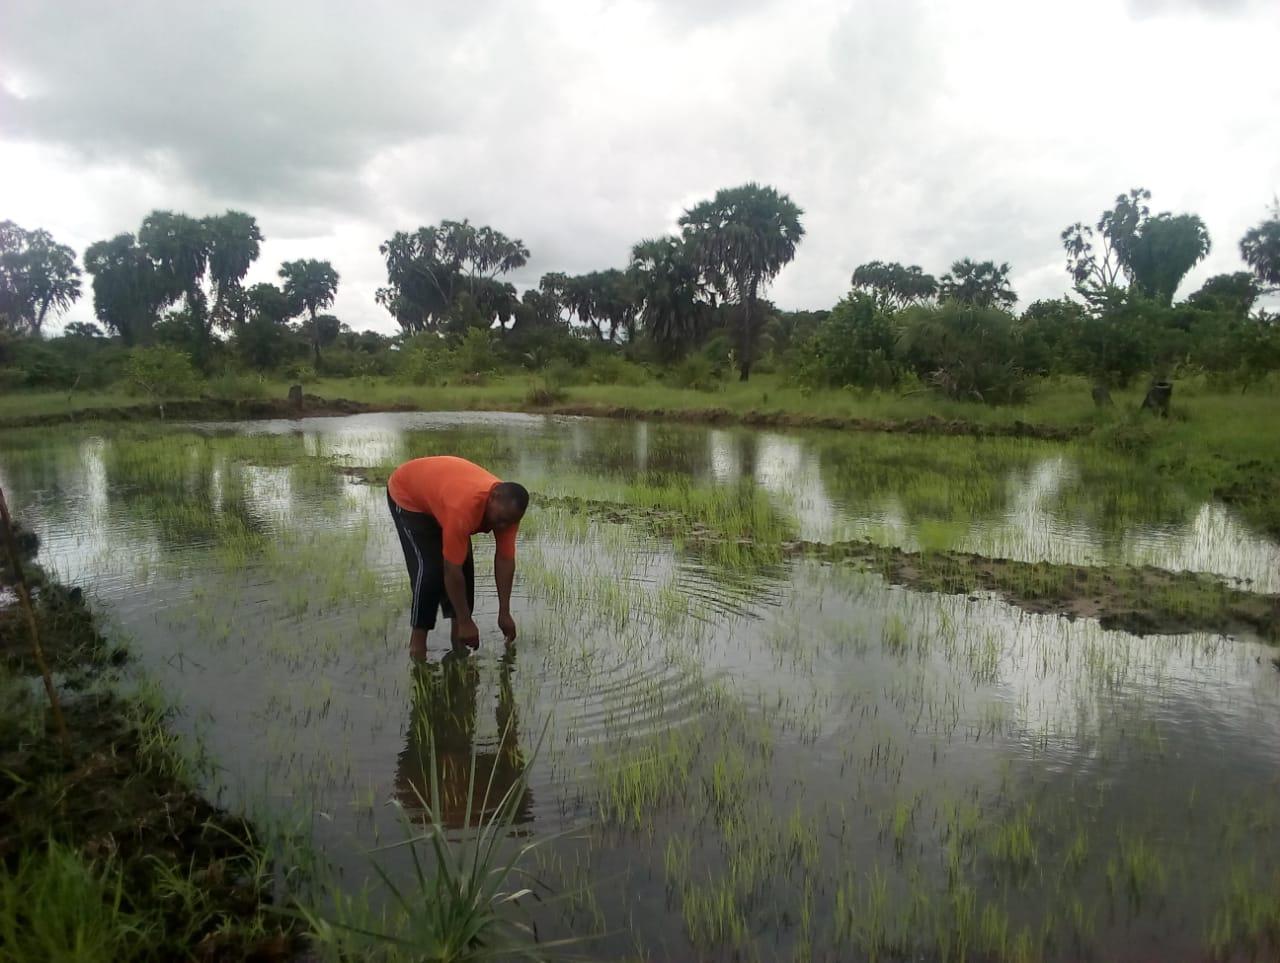 Farming assistance project in Kenya.